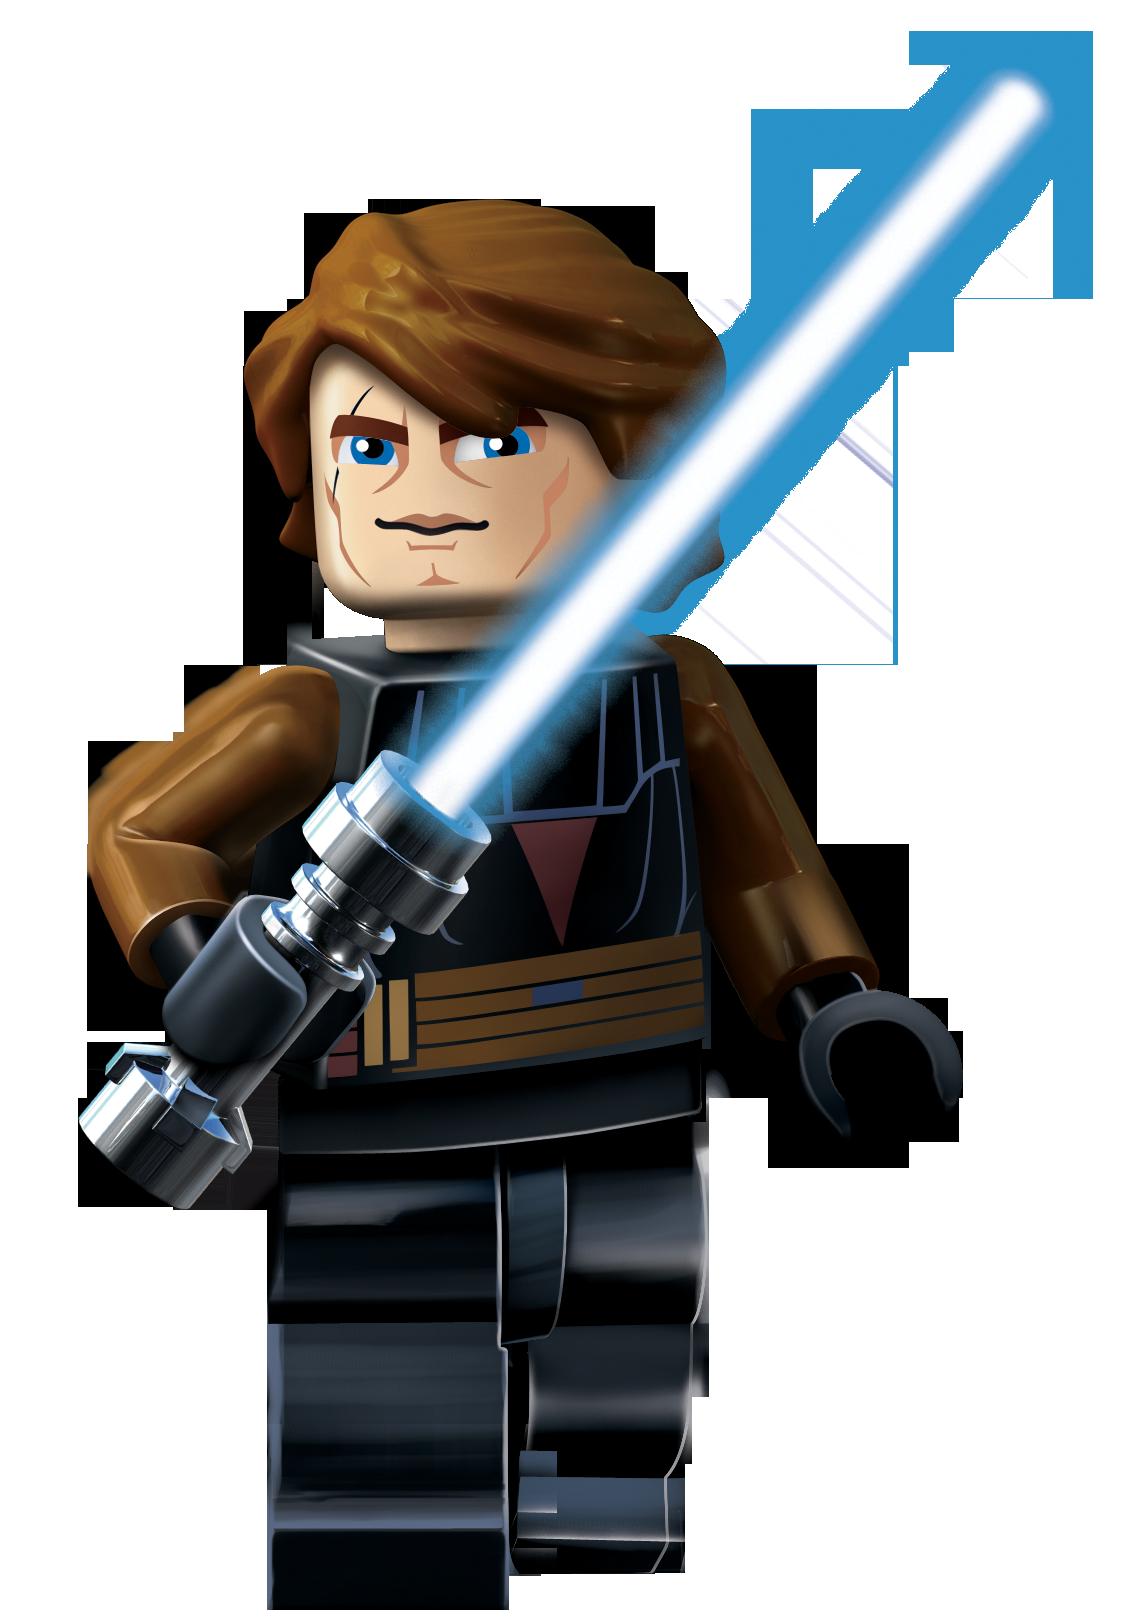 ... 12> Images For - Star Wars The Clone Wars Anakin Skywalker Wiki